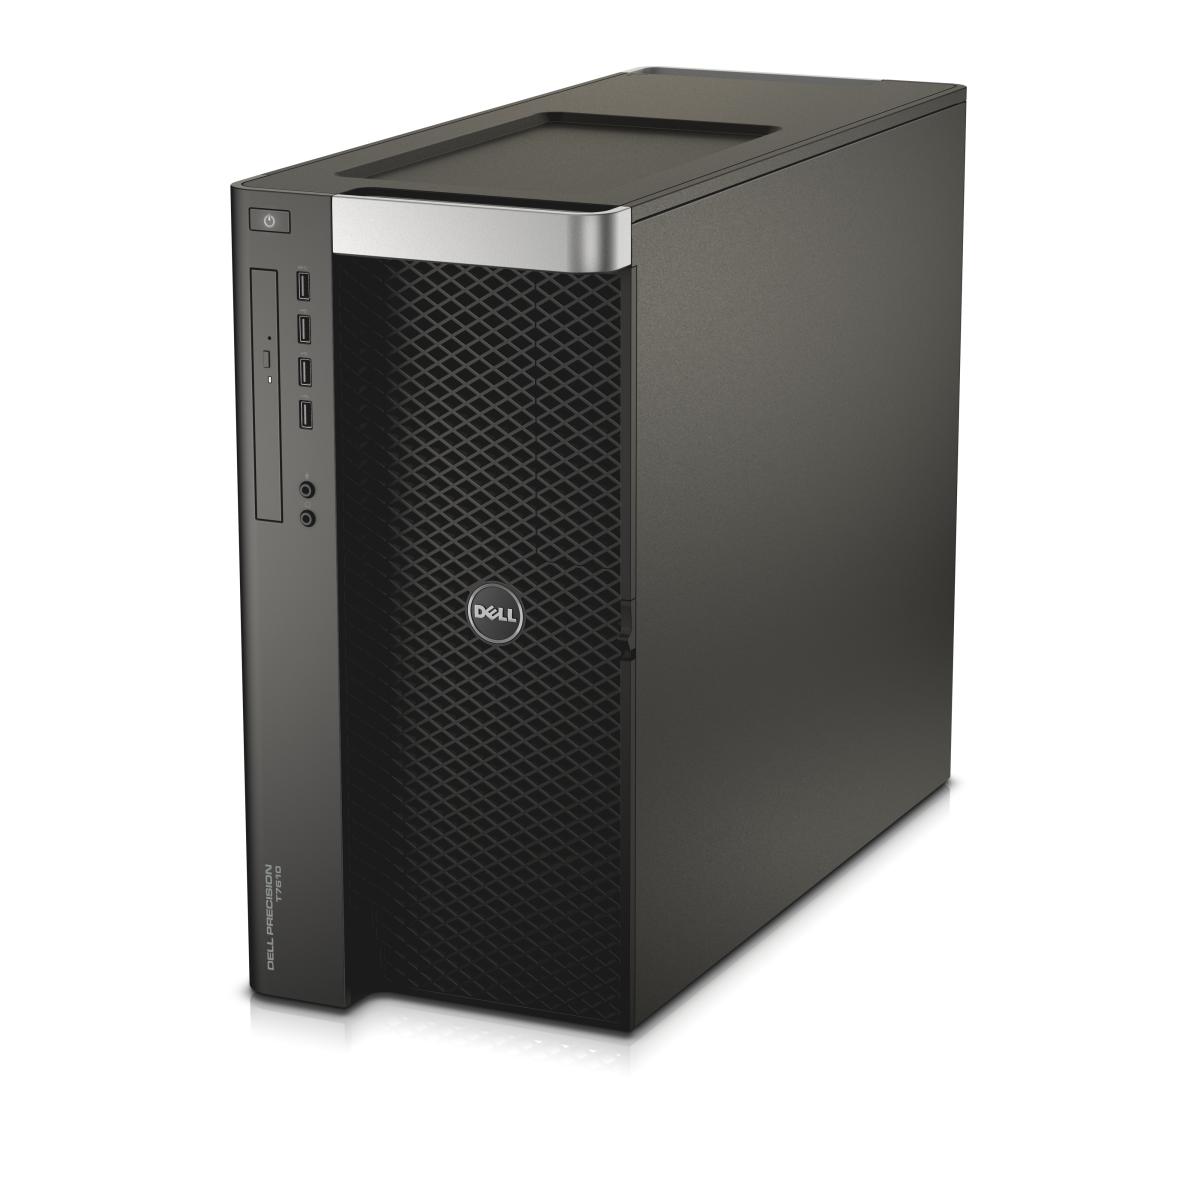 Server Dell Precision T7610 Workstation Berkinerja Tangguh_3